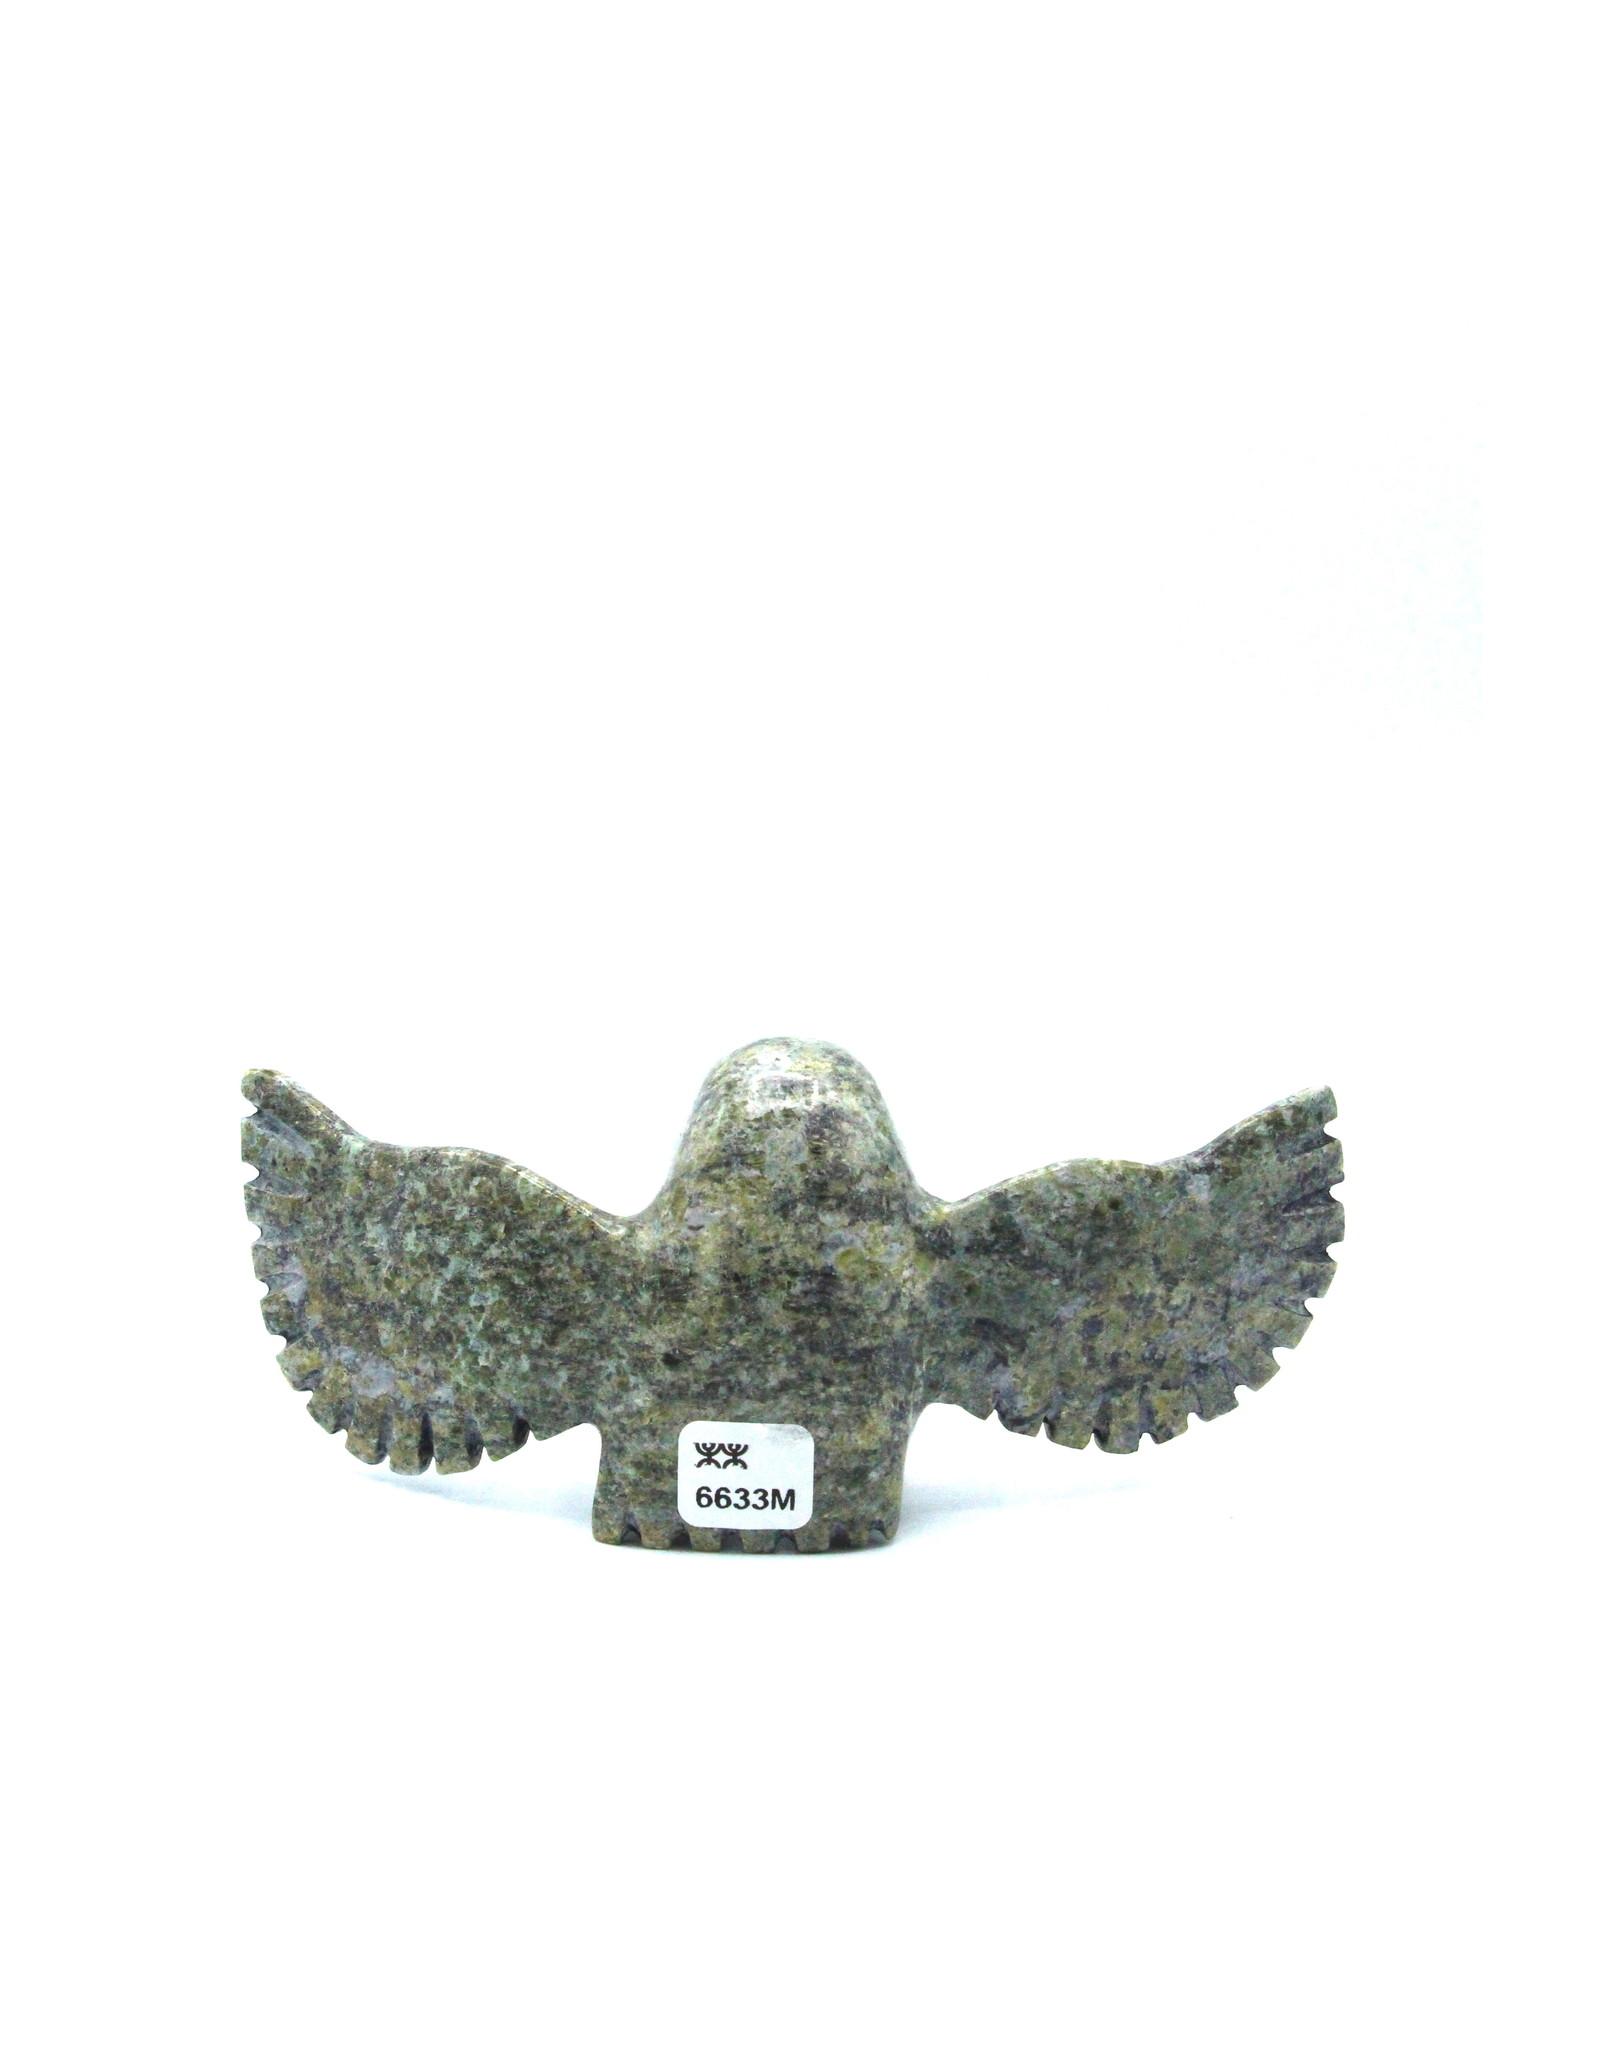 6633M Owl by Palaya Qiatsuq